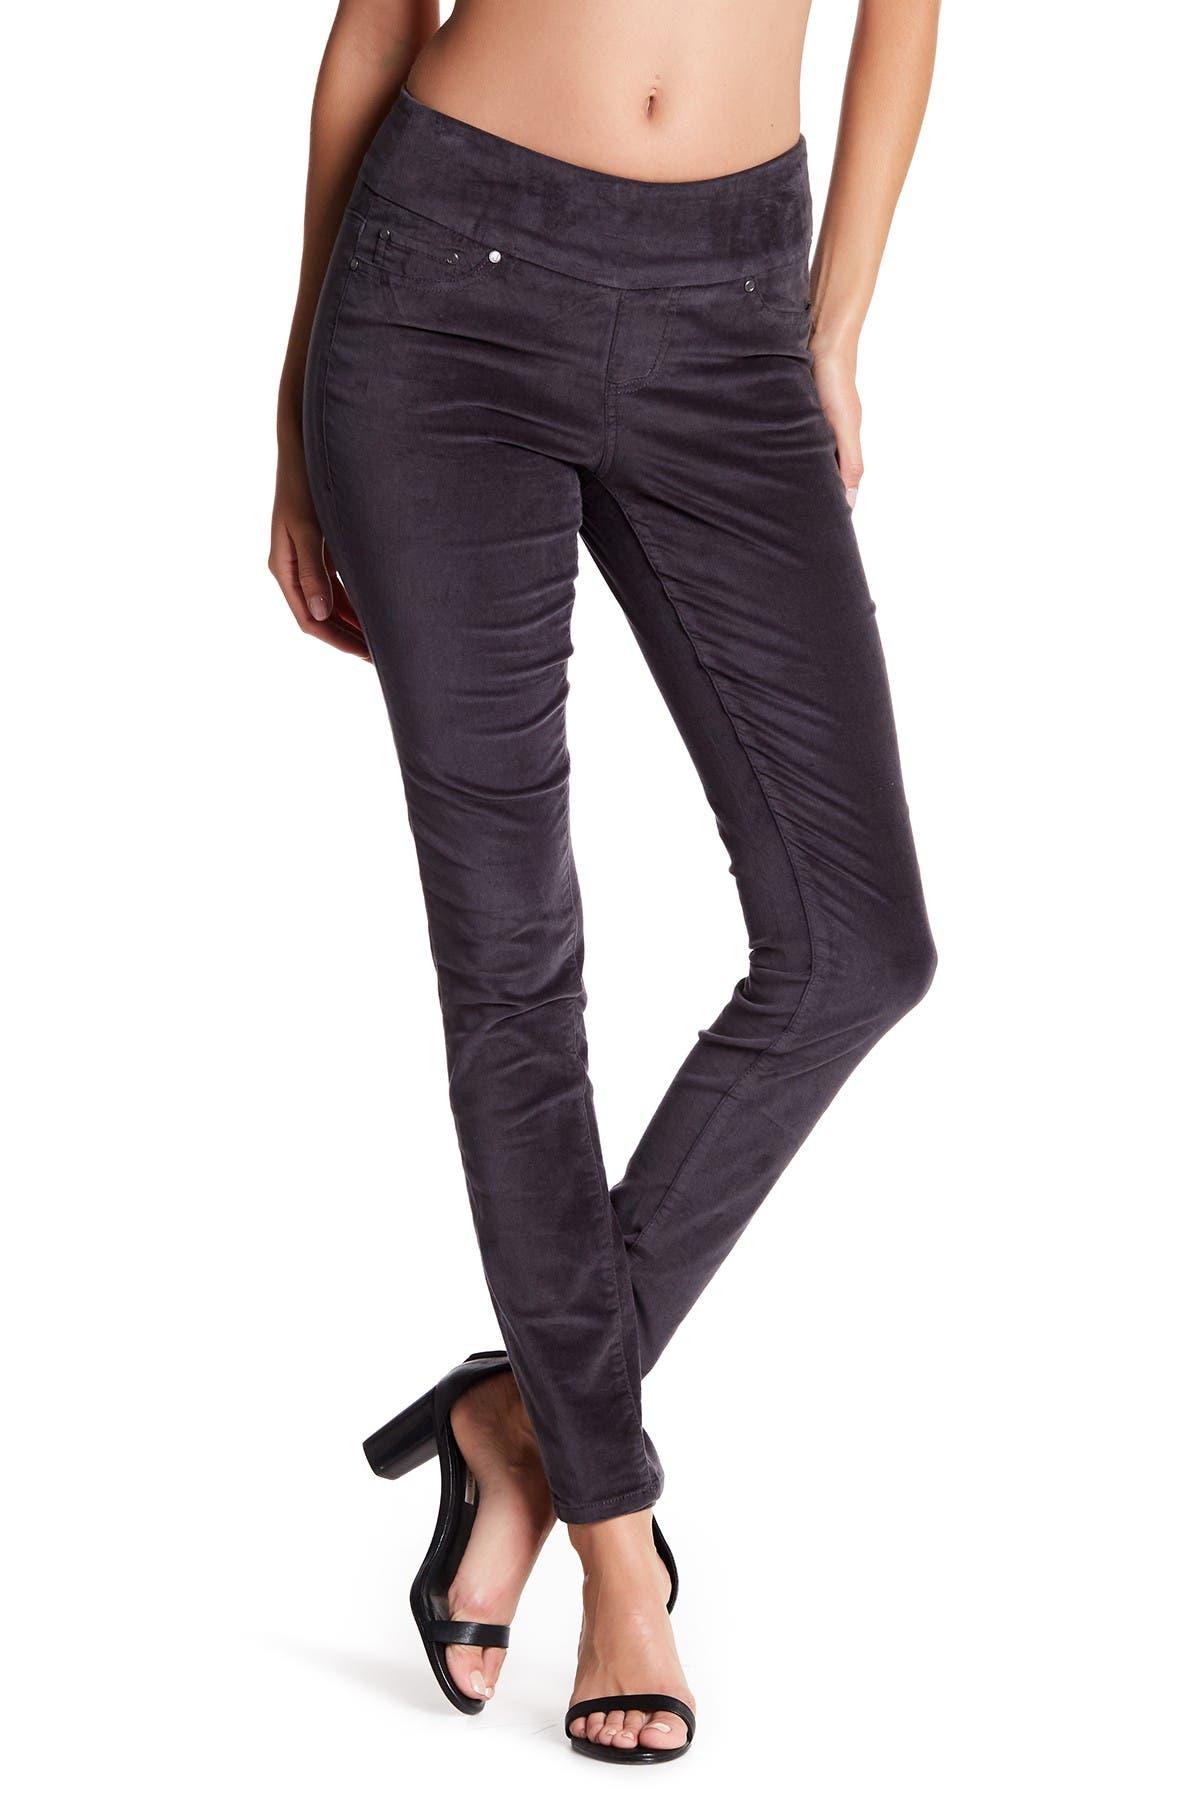 Image of JAG Jeans Nora Stretch Velvet Skinny Pants